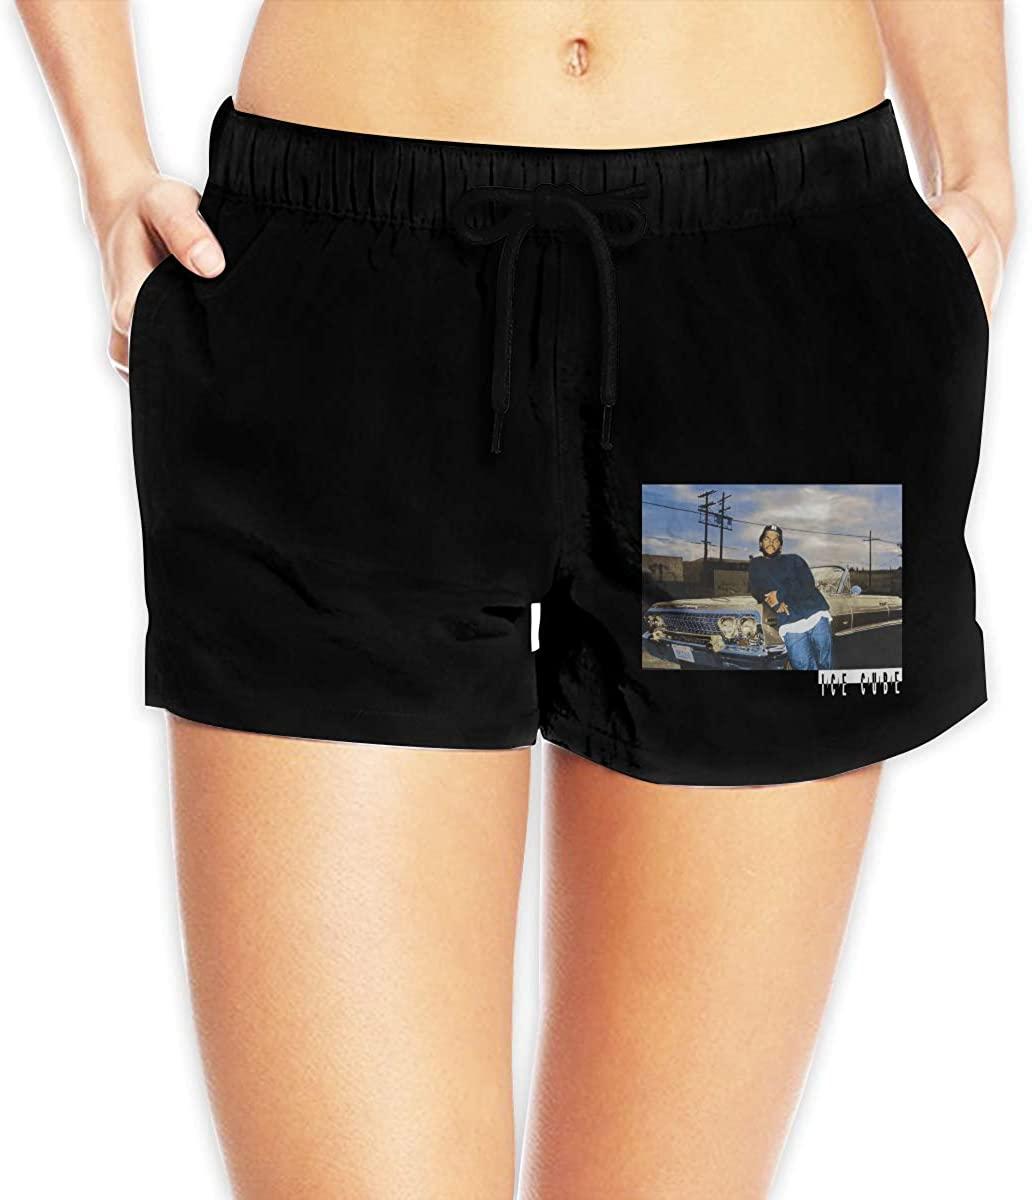 Women Sexy Hot Pants Summer Casual Shorts Impala Short Beach Trousers